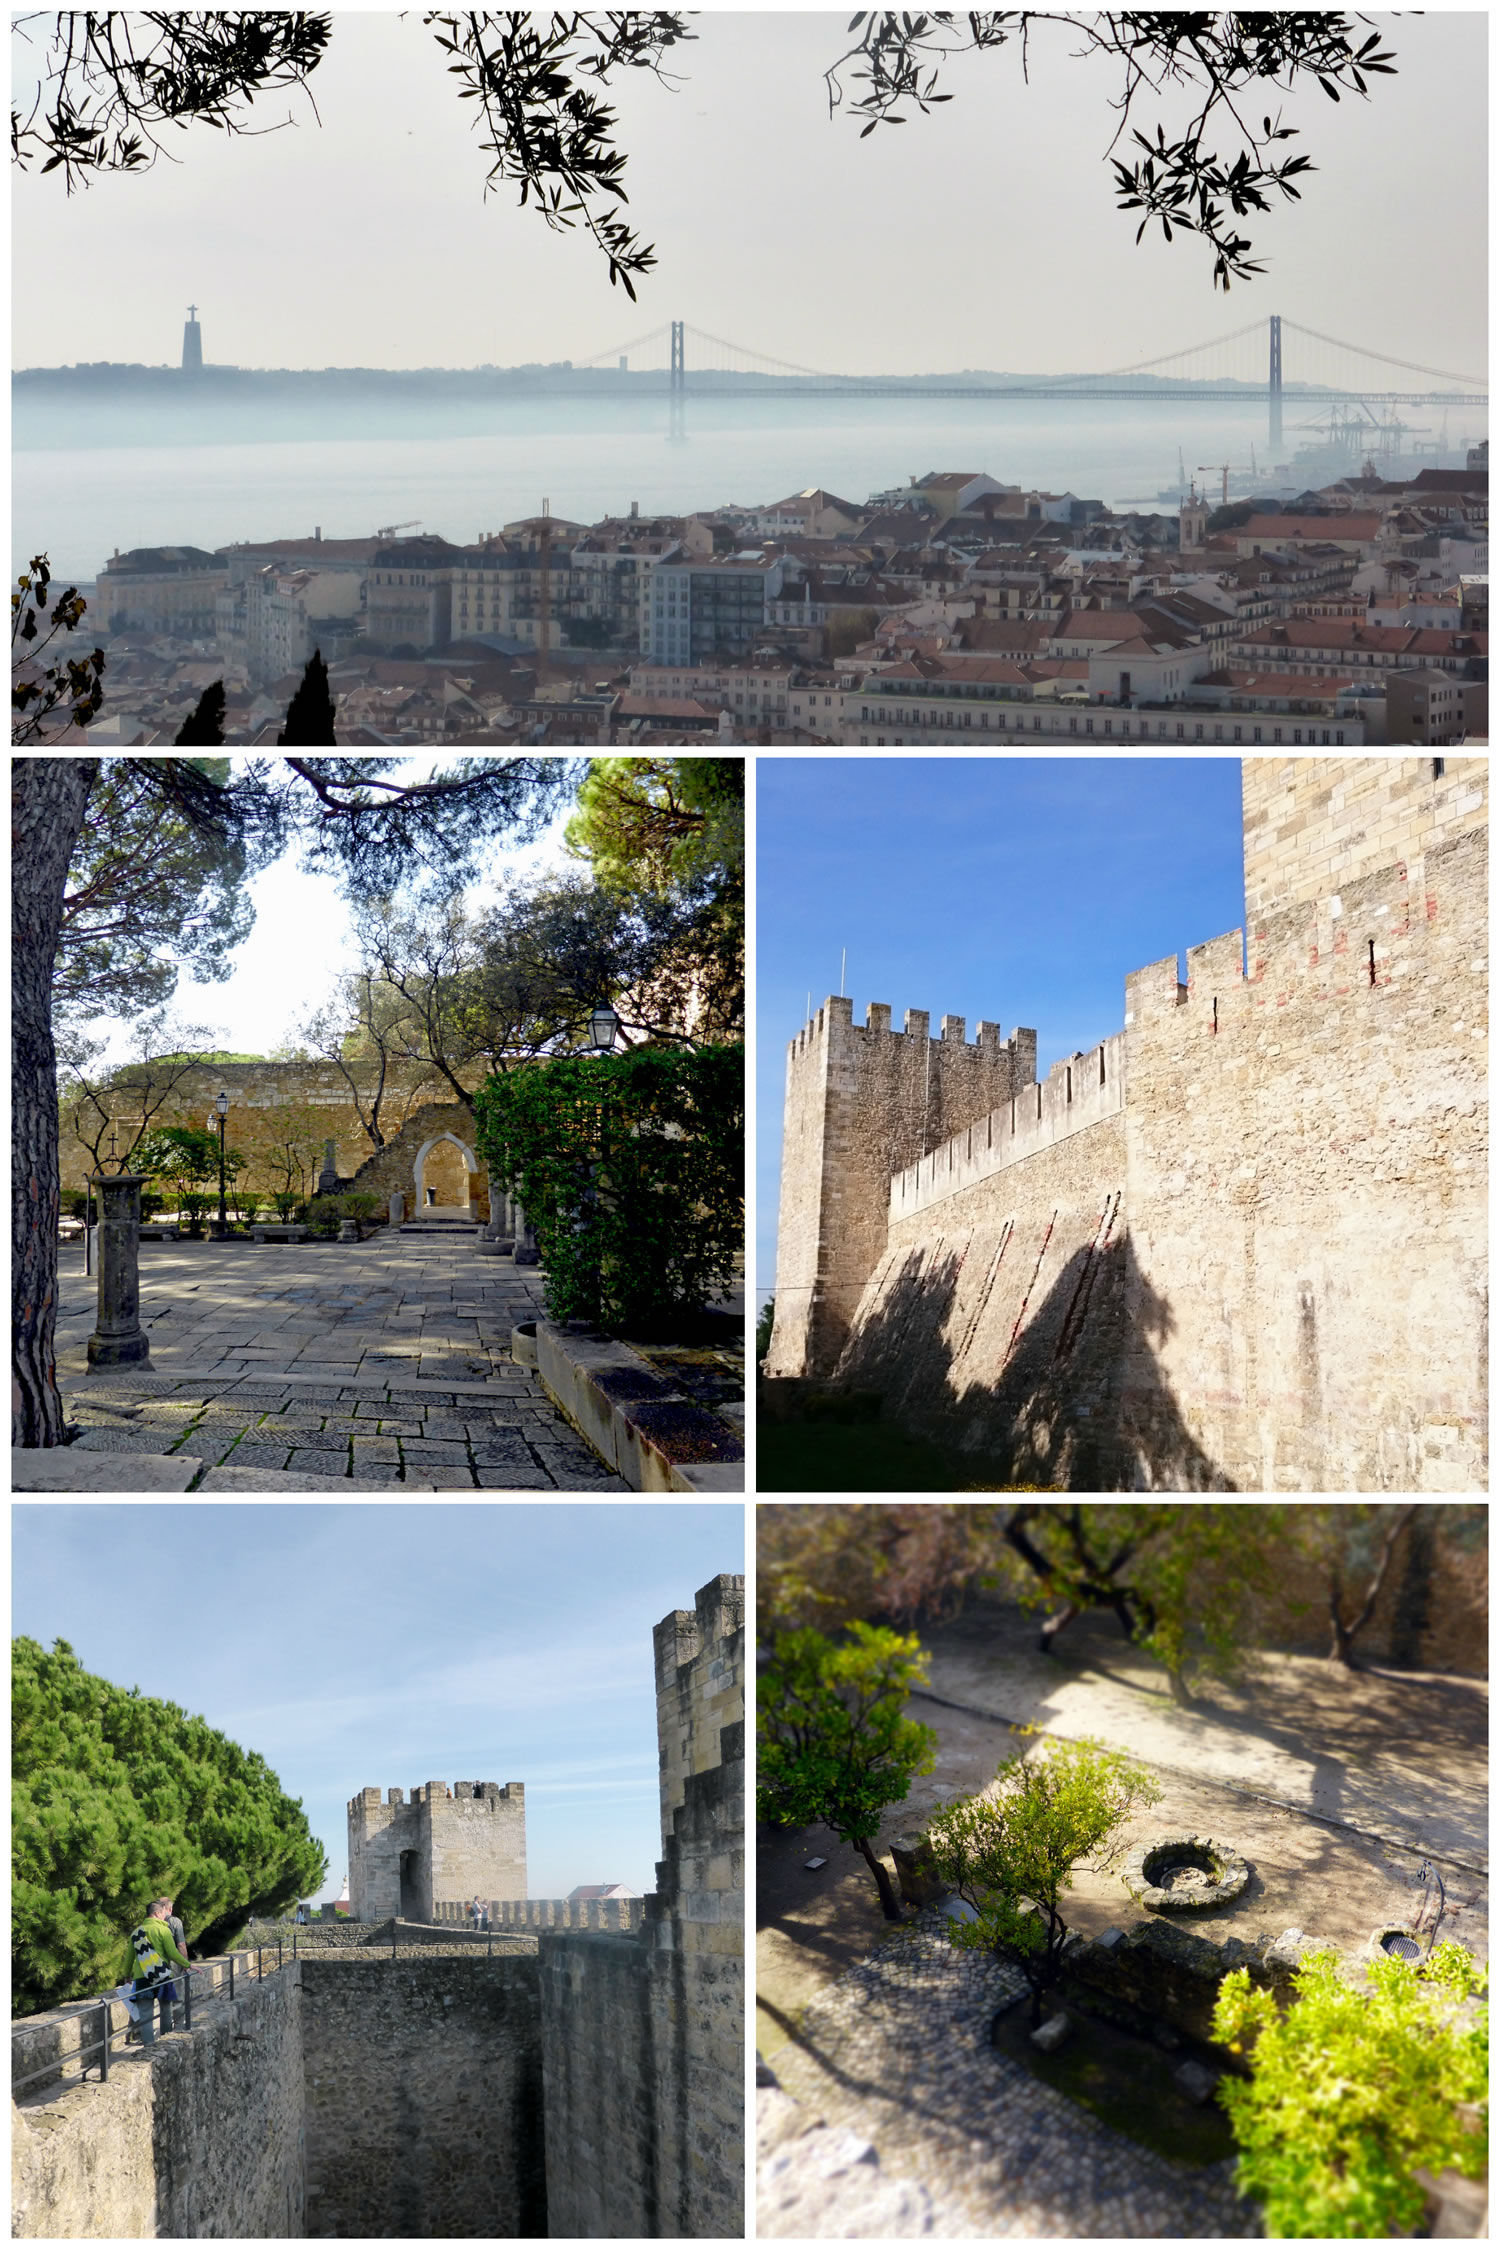 Lisbonne_Portugal_CasteloSaoJorge